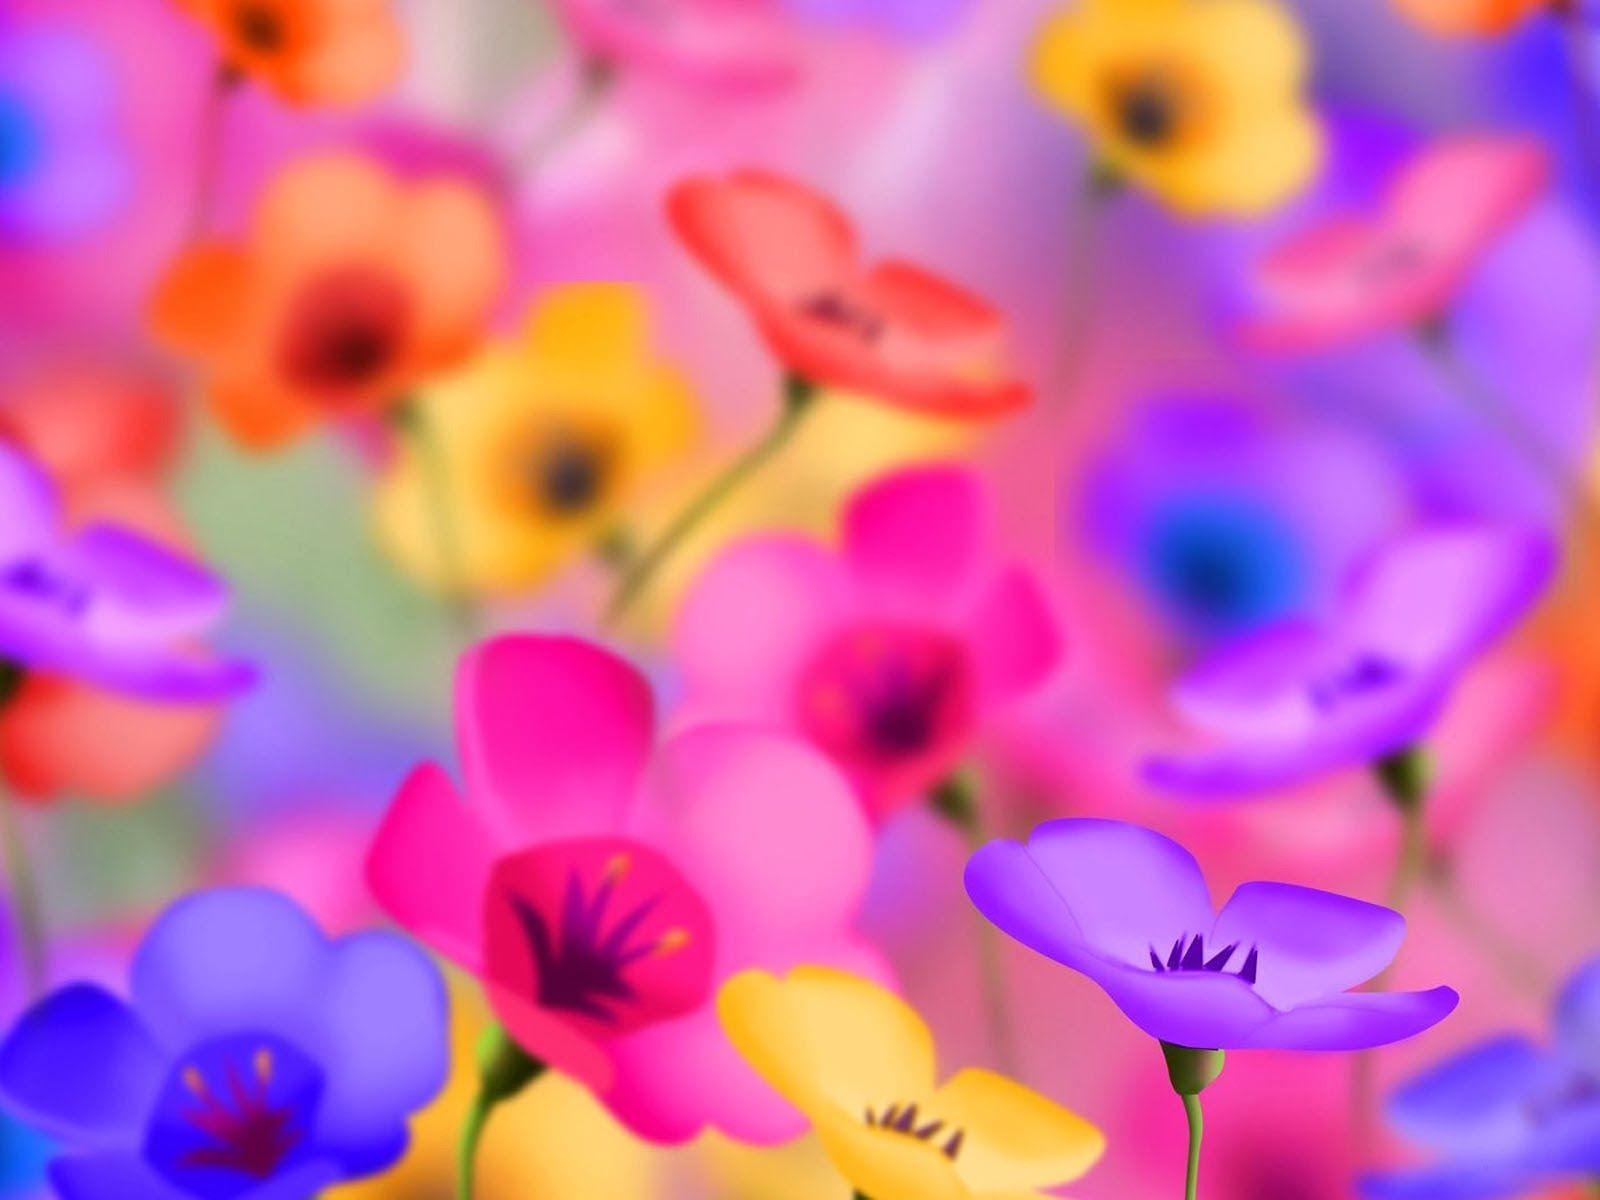 Beautiful flowers wallpaper free download archives free desktop - Nature Wallpaper Wallpapers For Free Download About Hd Flower Wallpaperbeautiful